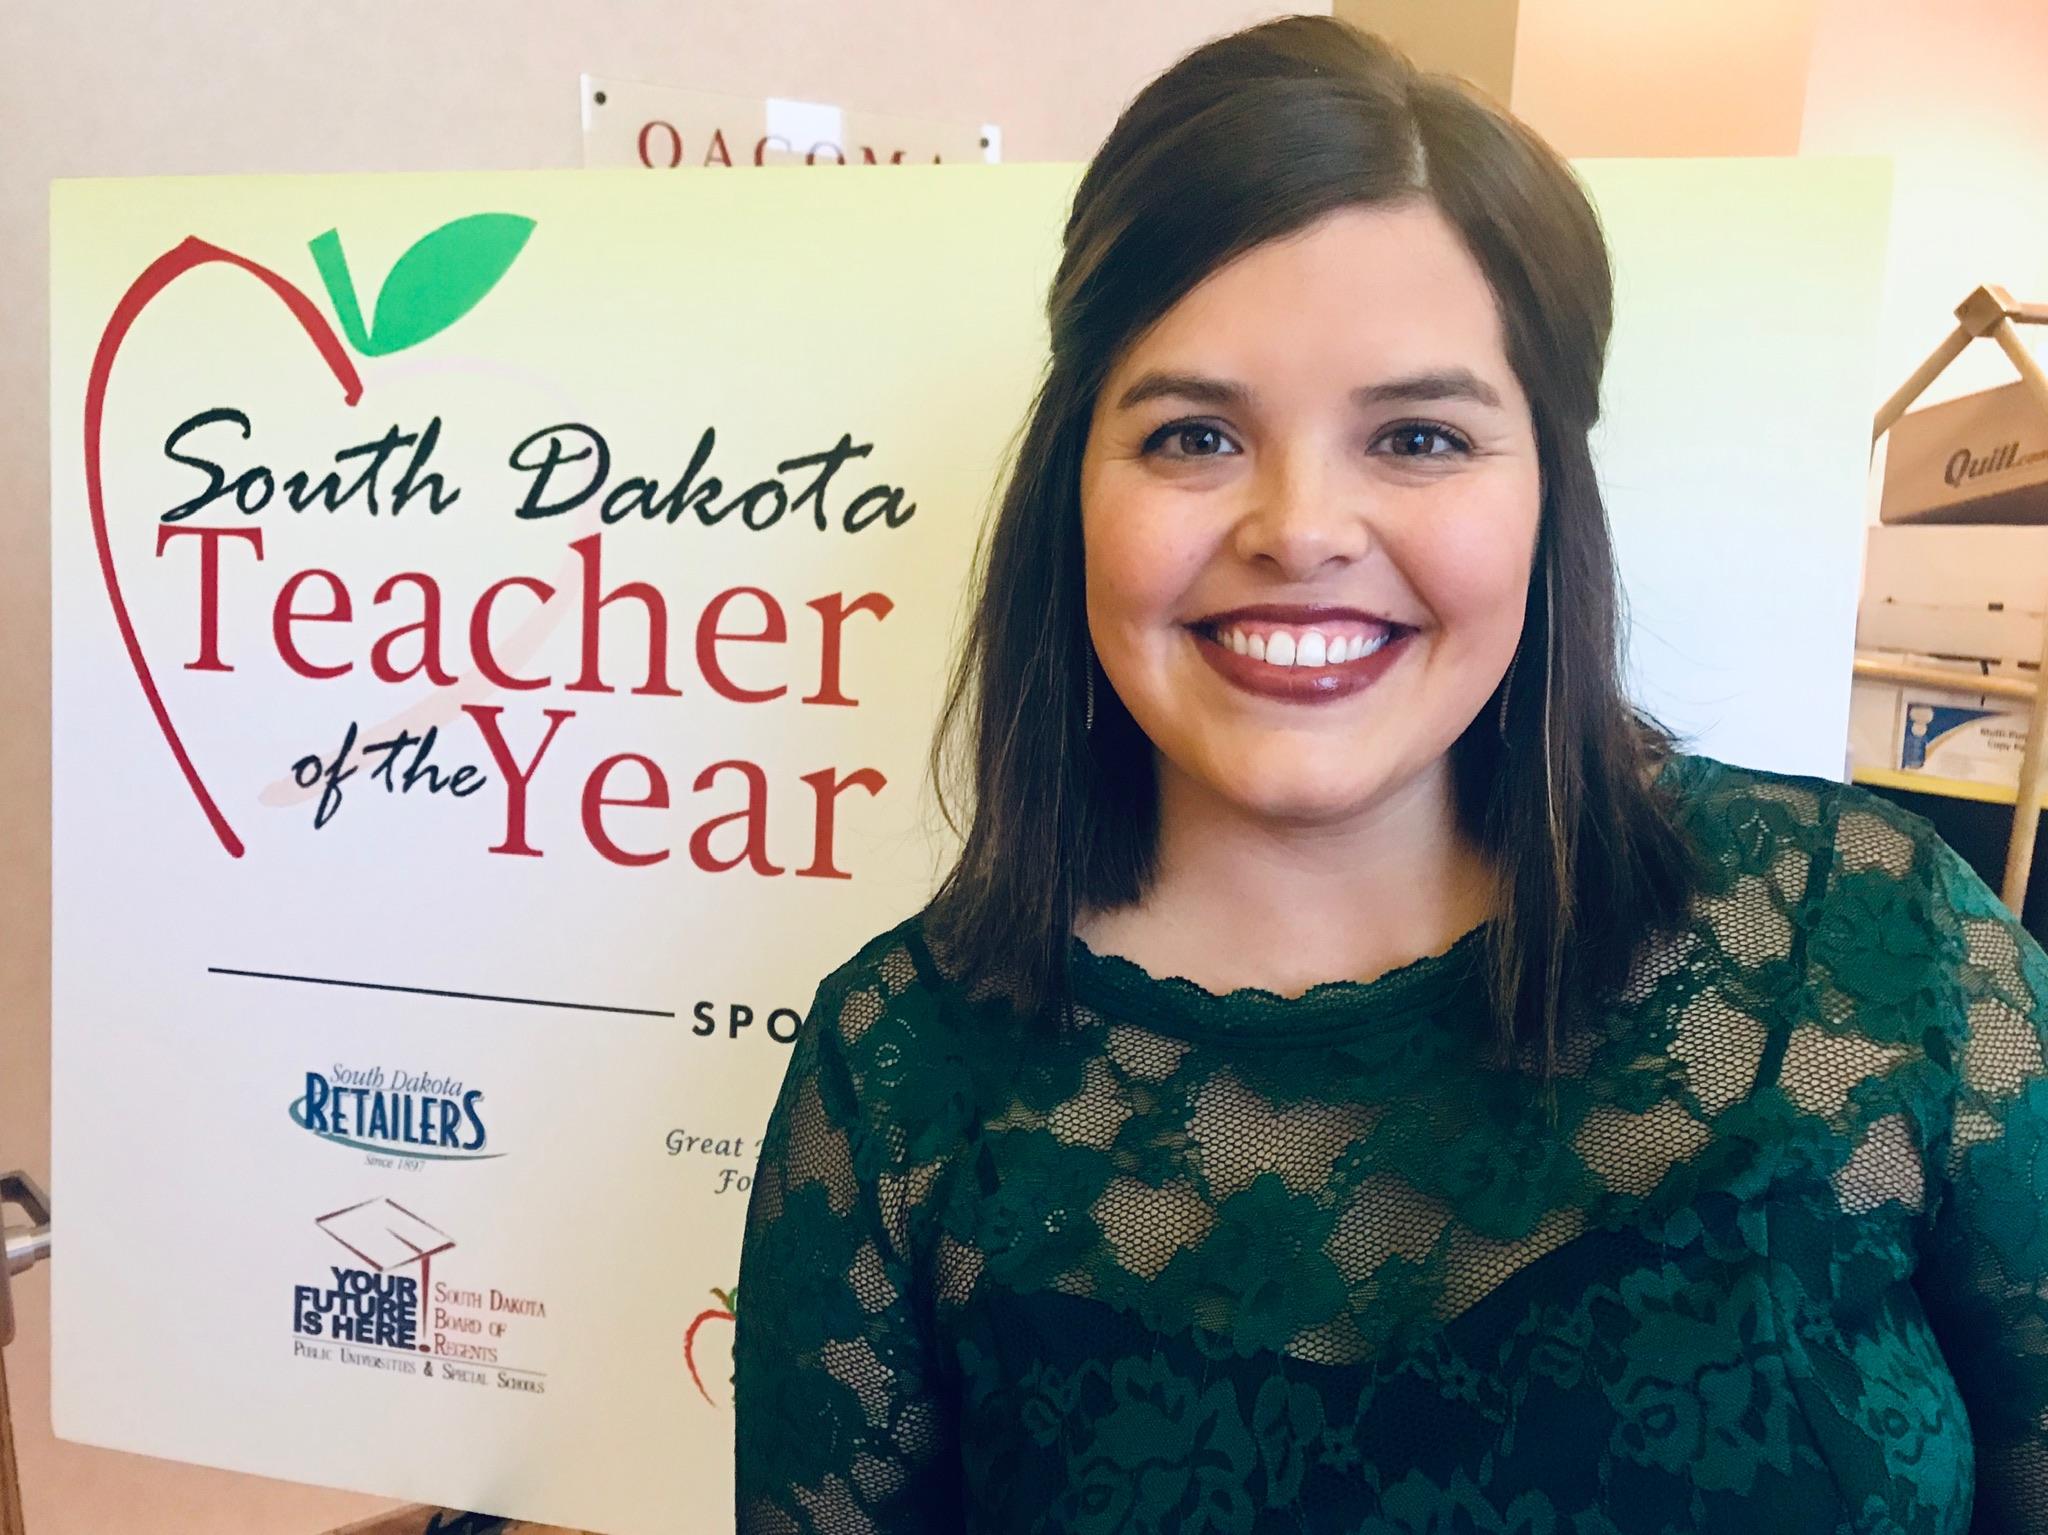 dakota teacher graduate early university state